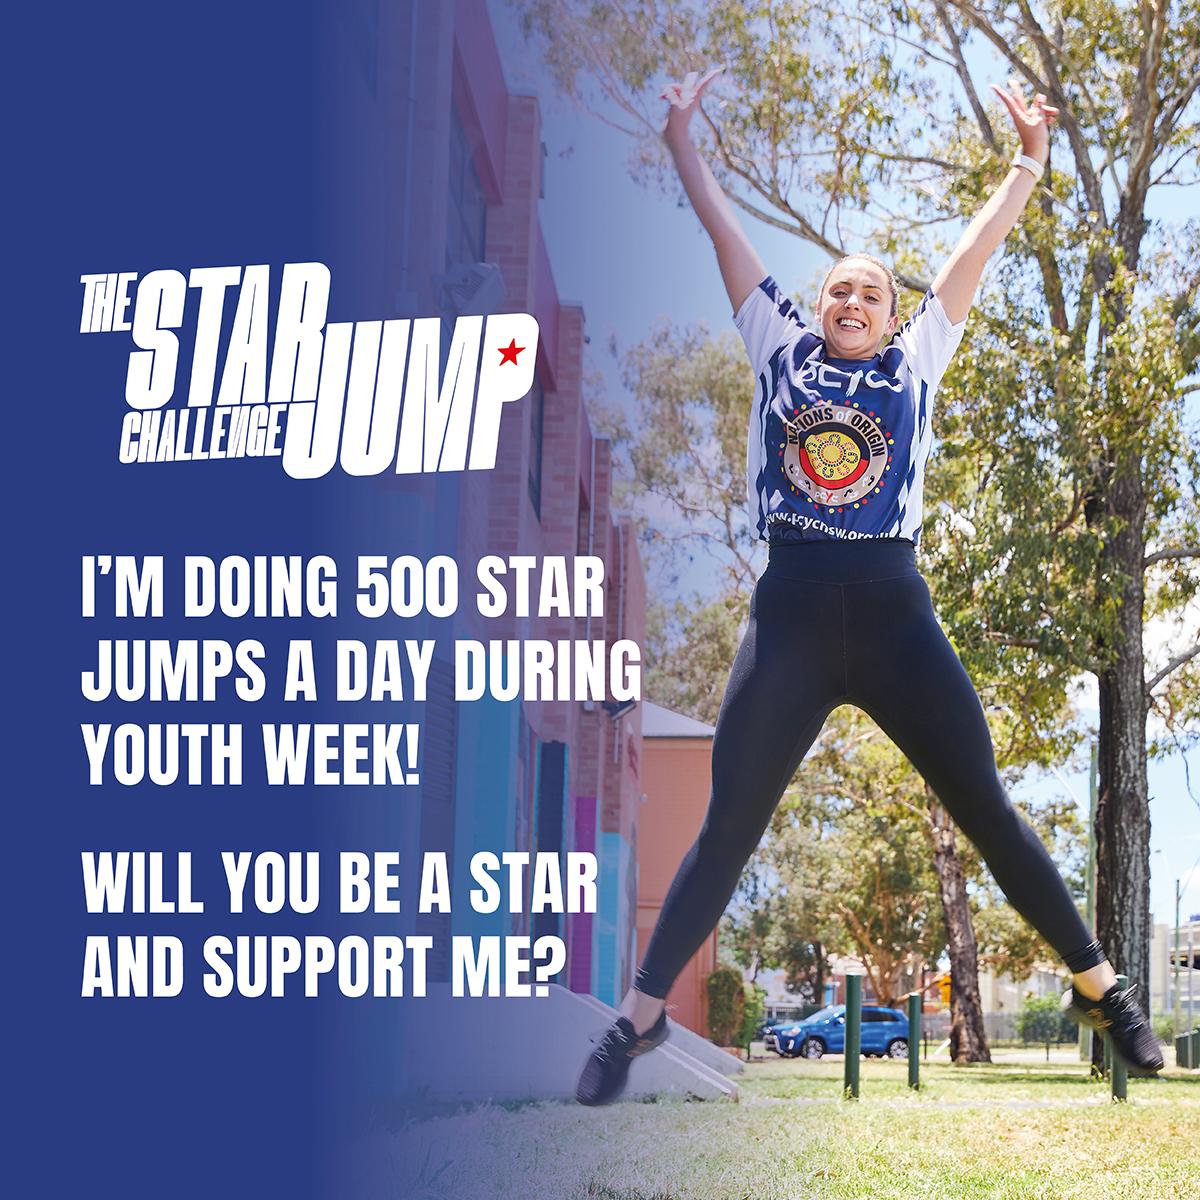 Social Tile 12 - Support - 500 Star Jumps